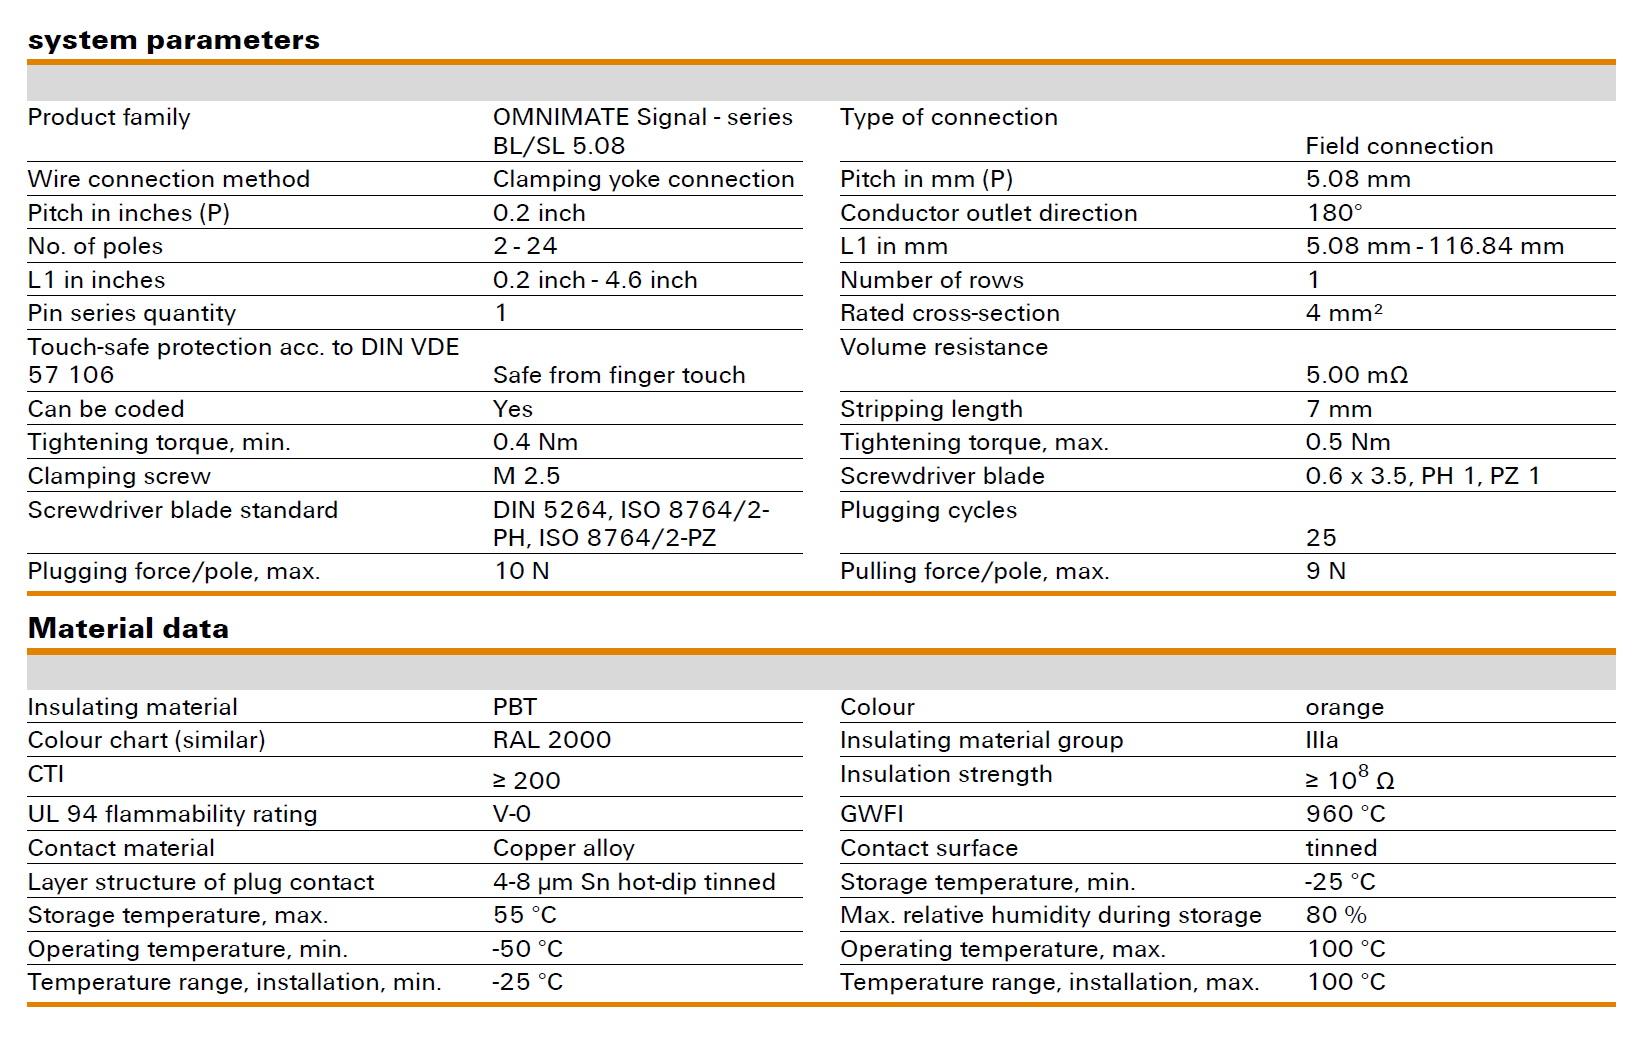 Weidmüller BLZP 5.08/180 Specifications